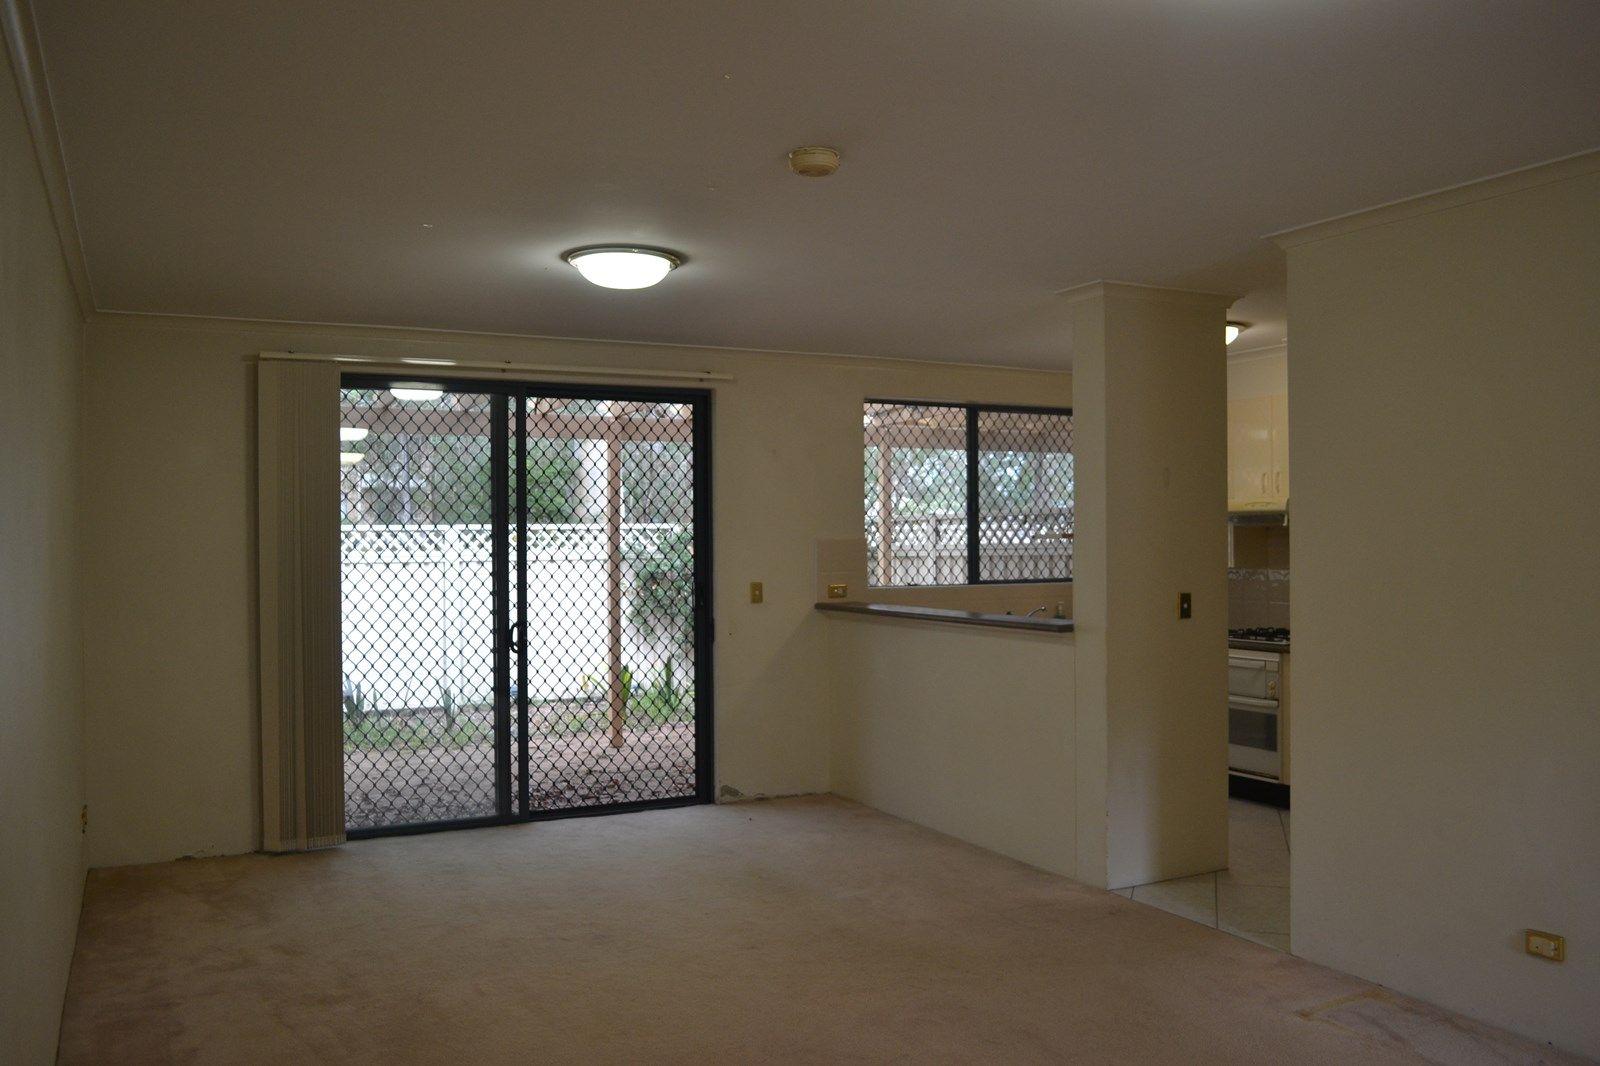 214/1-15 Fontenoy Road, Macquarie Park NSW 2113, Image 1